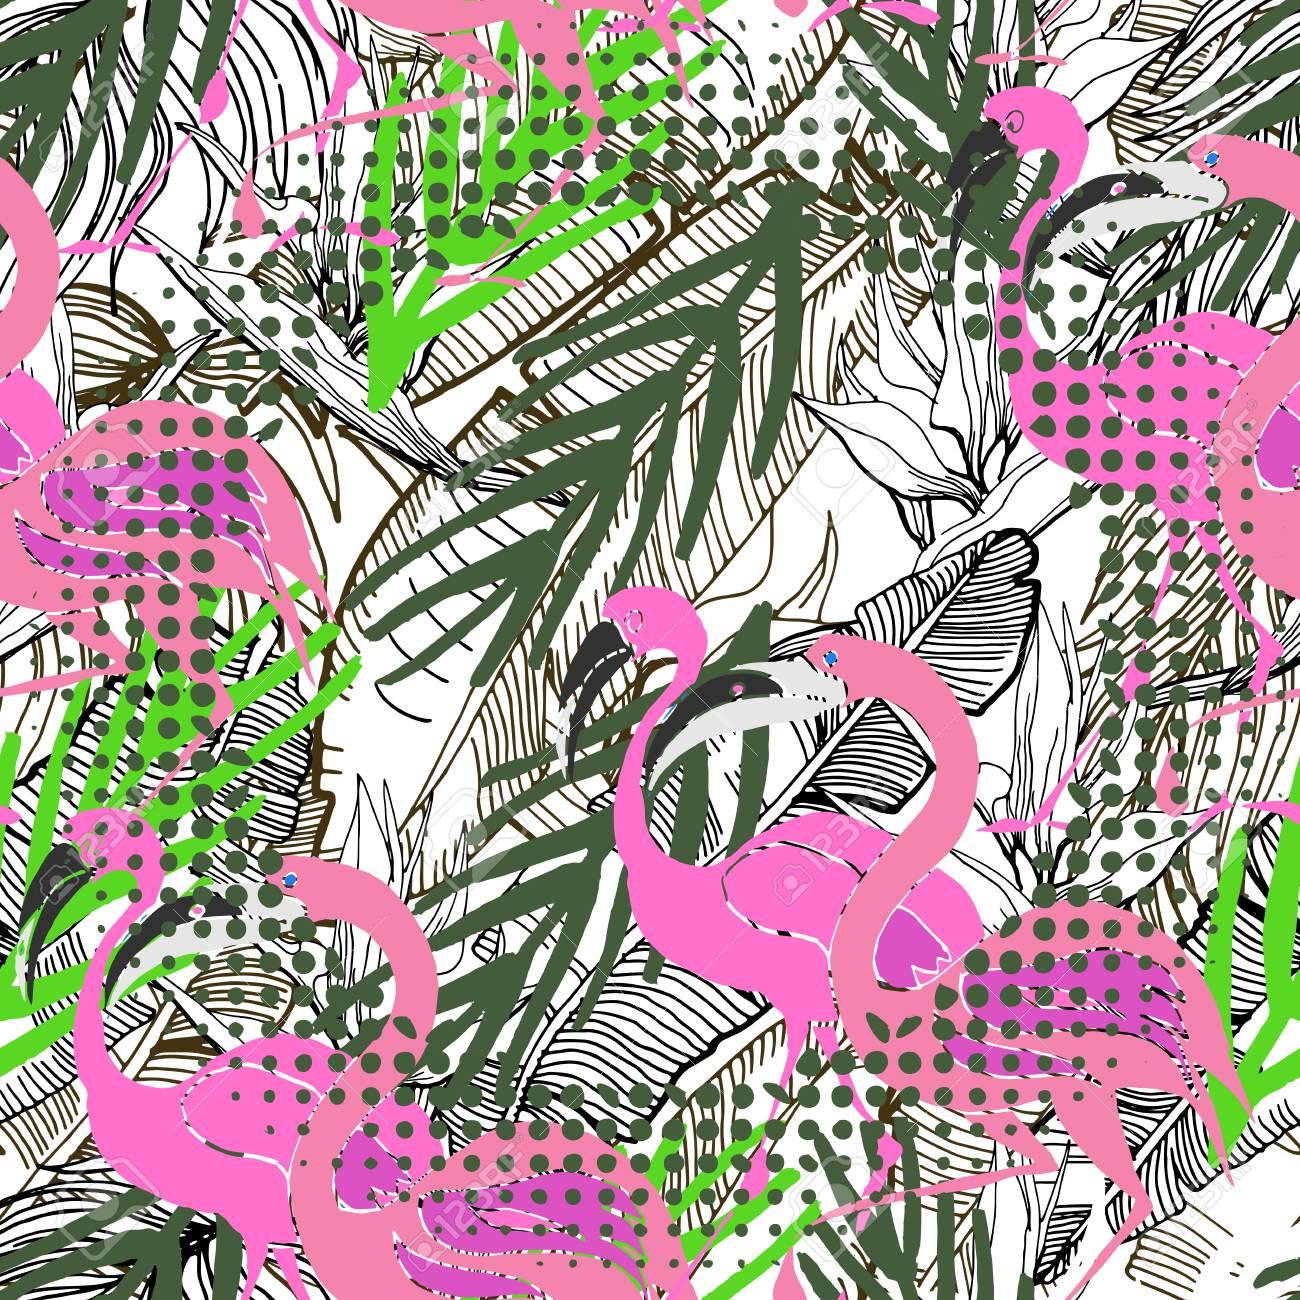 Fondo Transparente Tropical. Patrón De Vector Dibujado A Mano Con ...